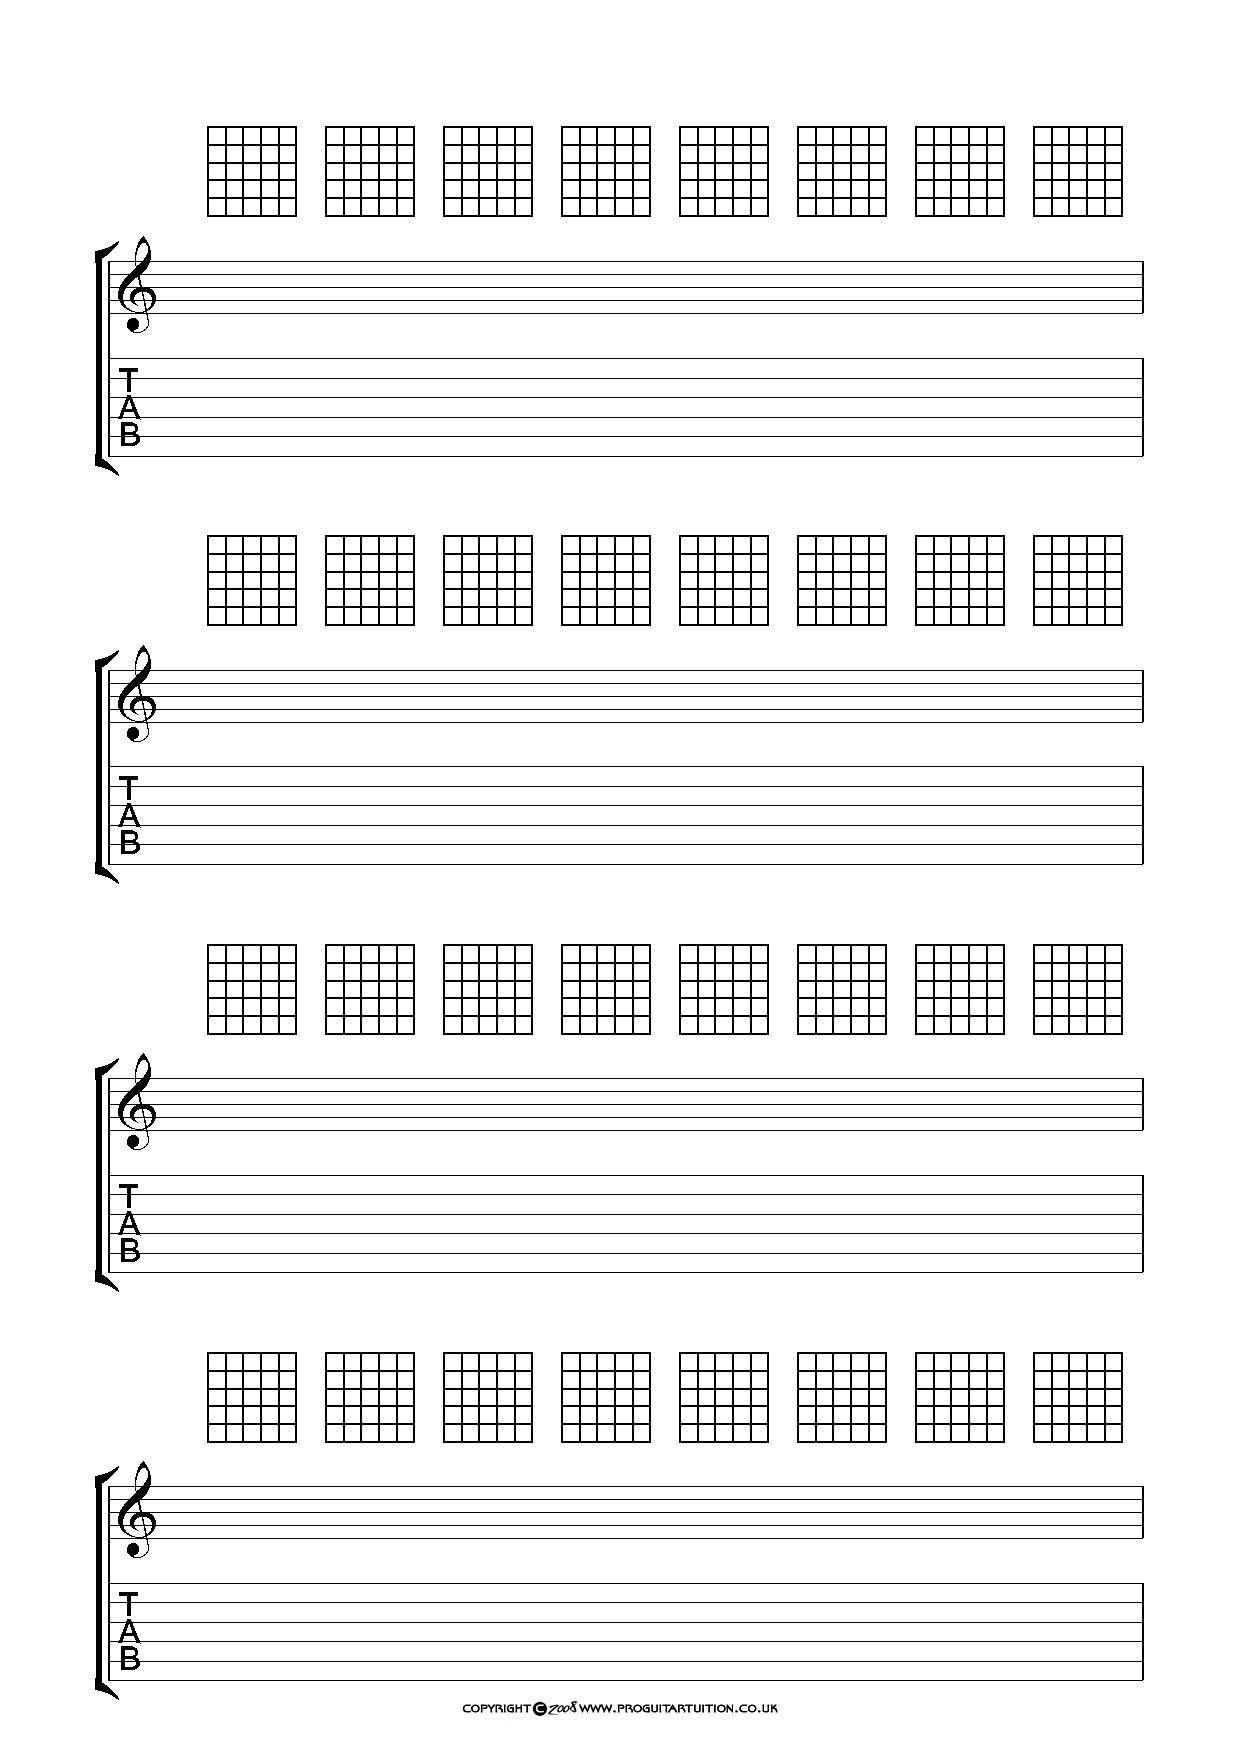 Blank Guitar Chord Sheet Blank Chord Sheets Google Search Music